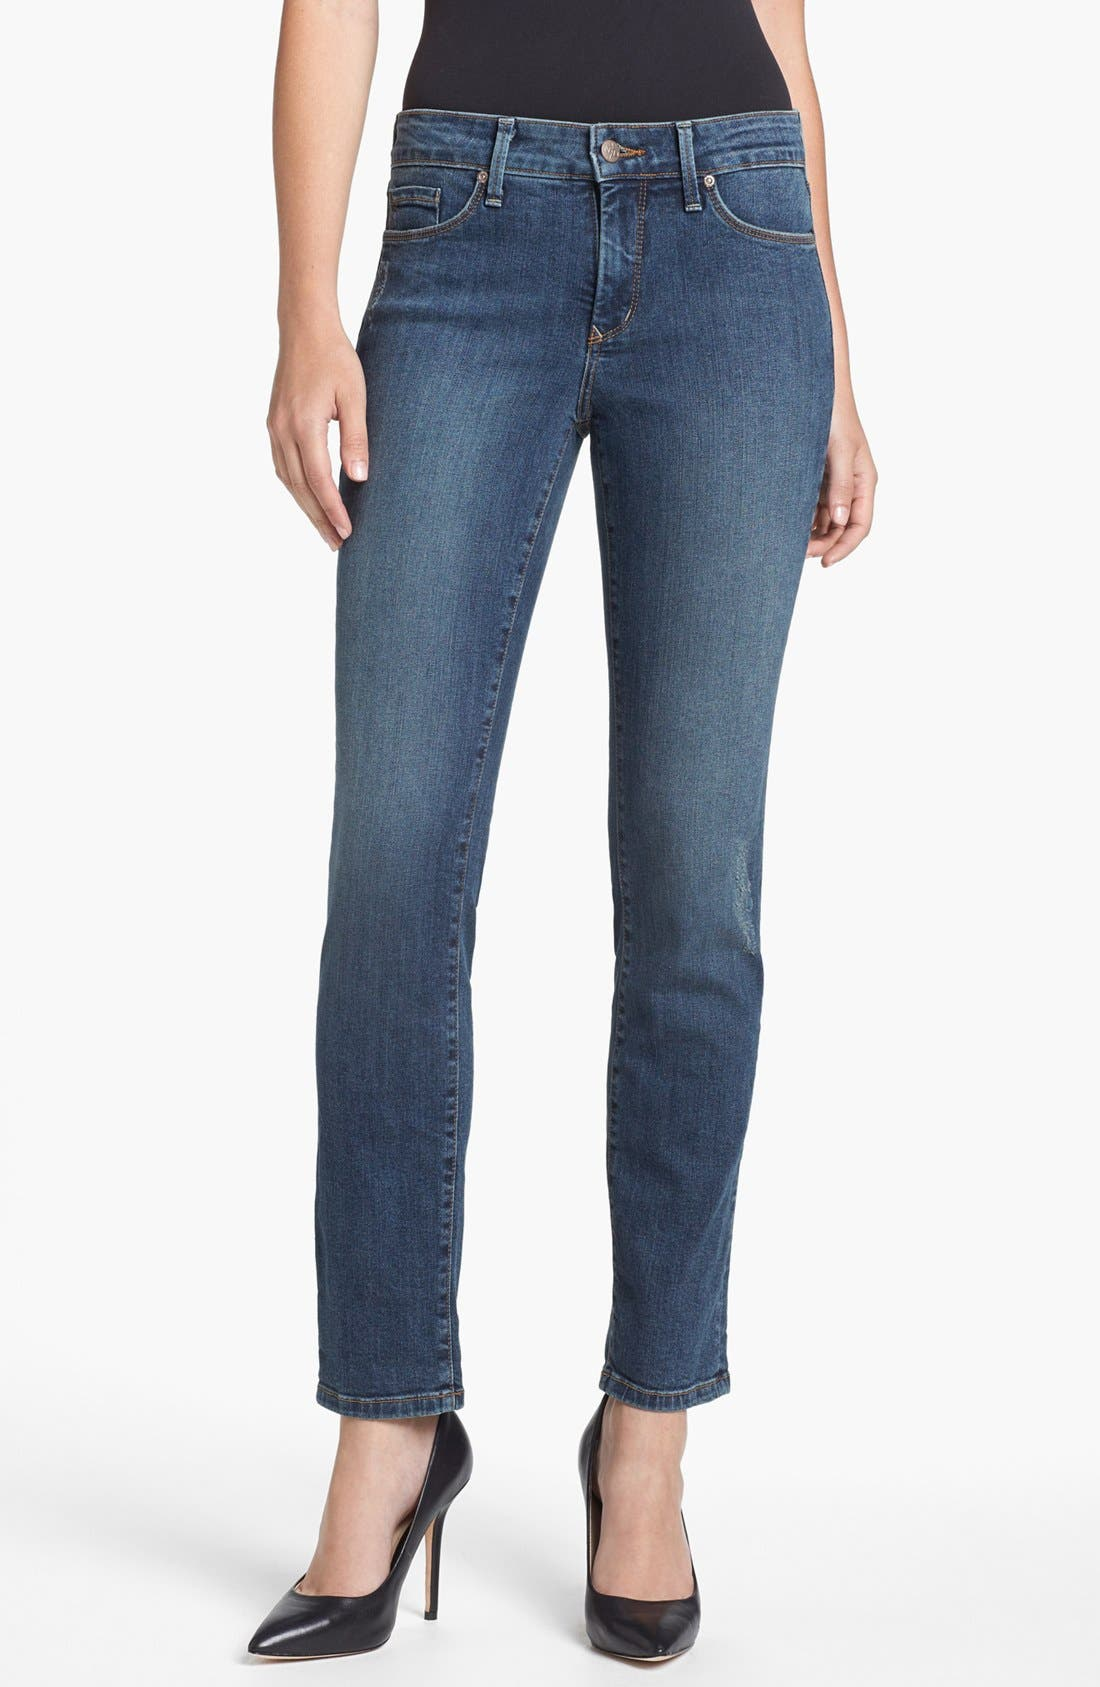 Alternate Image 2  - NYDJ 'Leann' Stretch Skinny Boyfriend Jeans (Loma Linda)